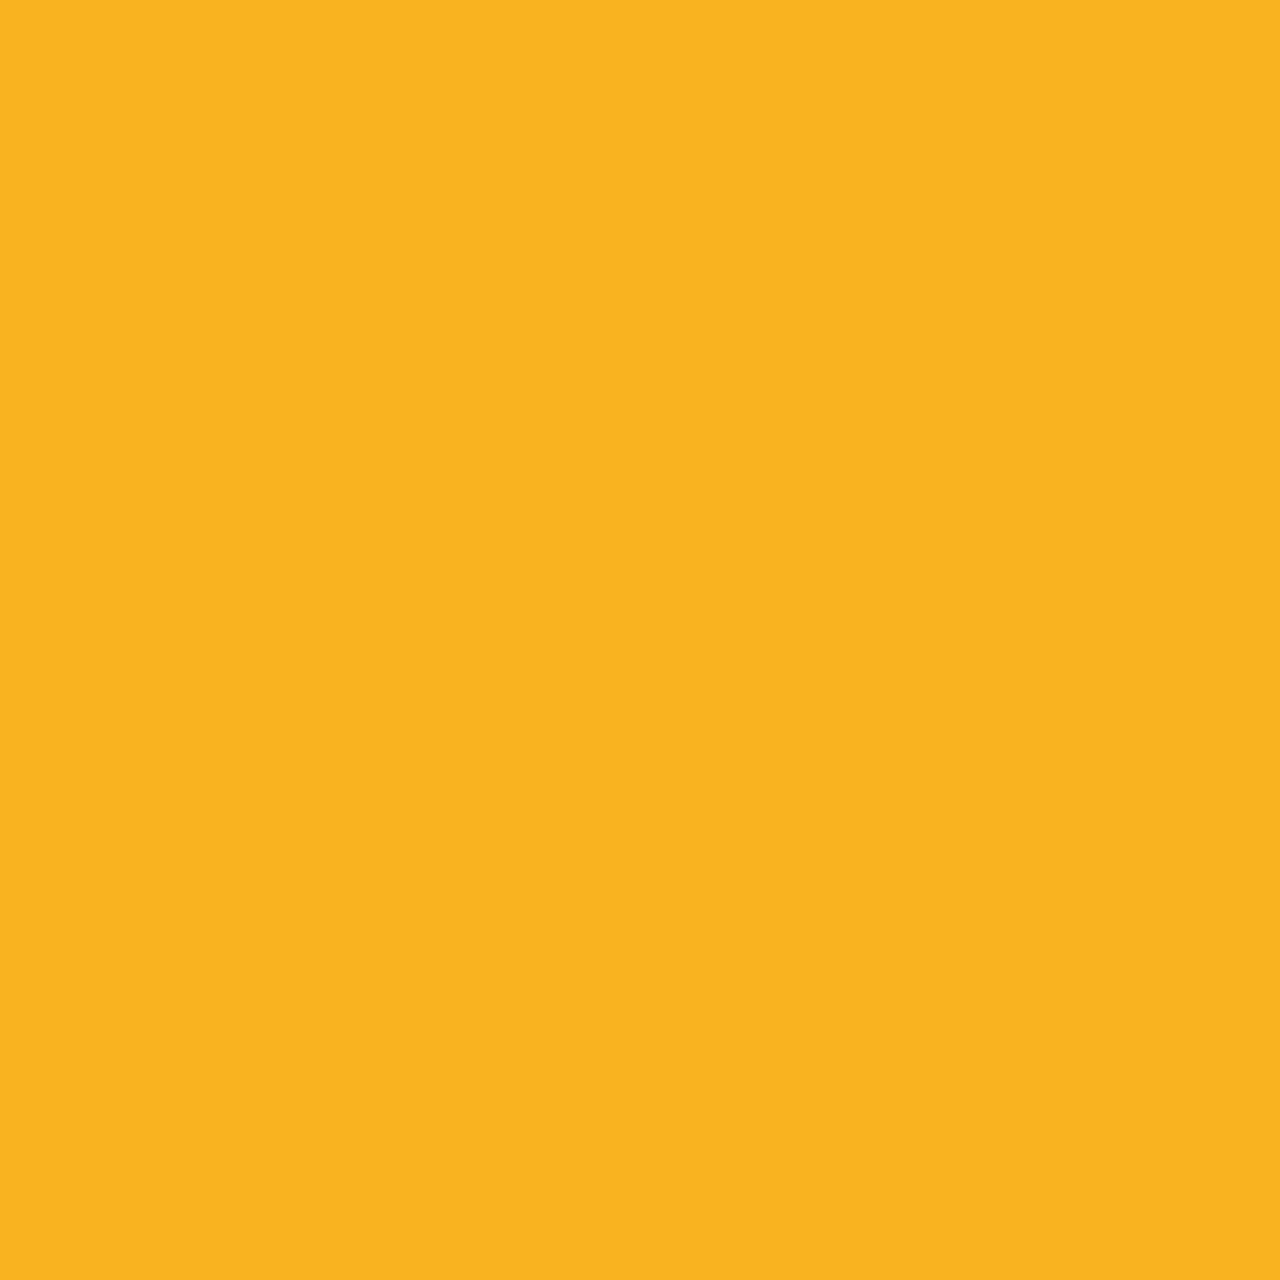 Team Yellow Room